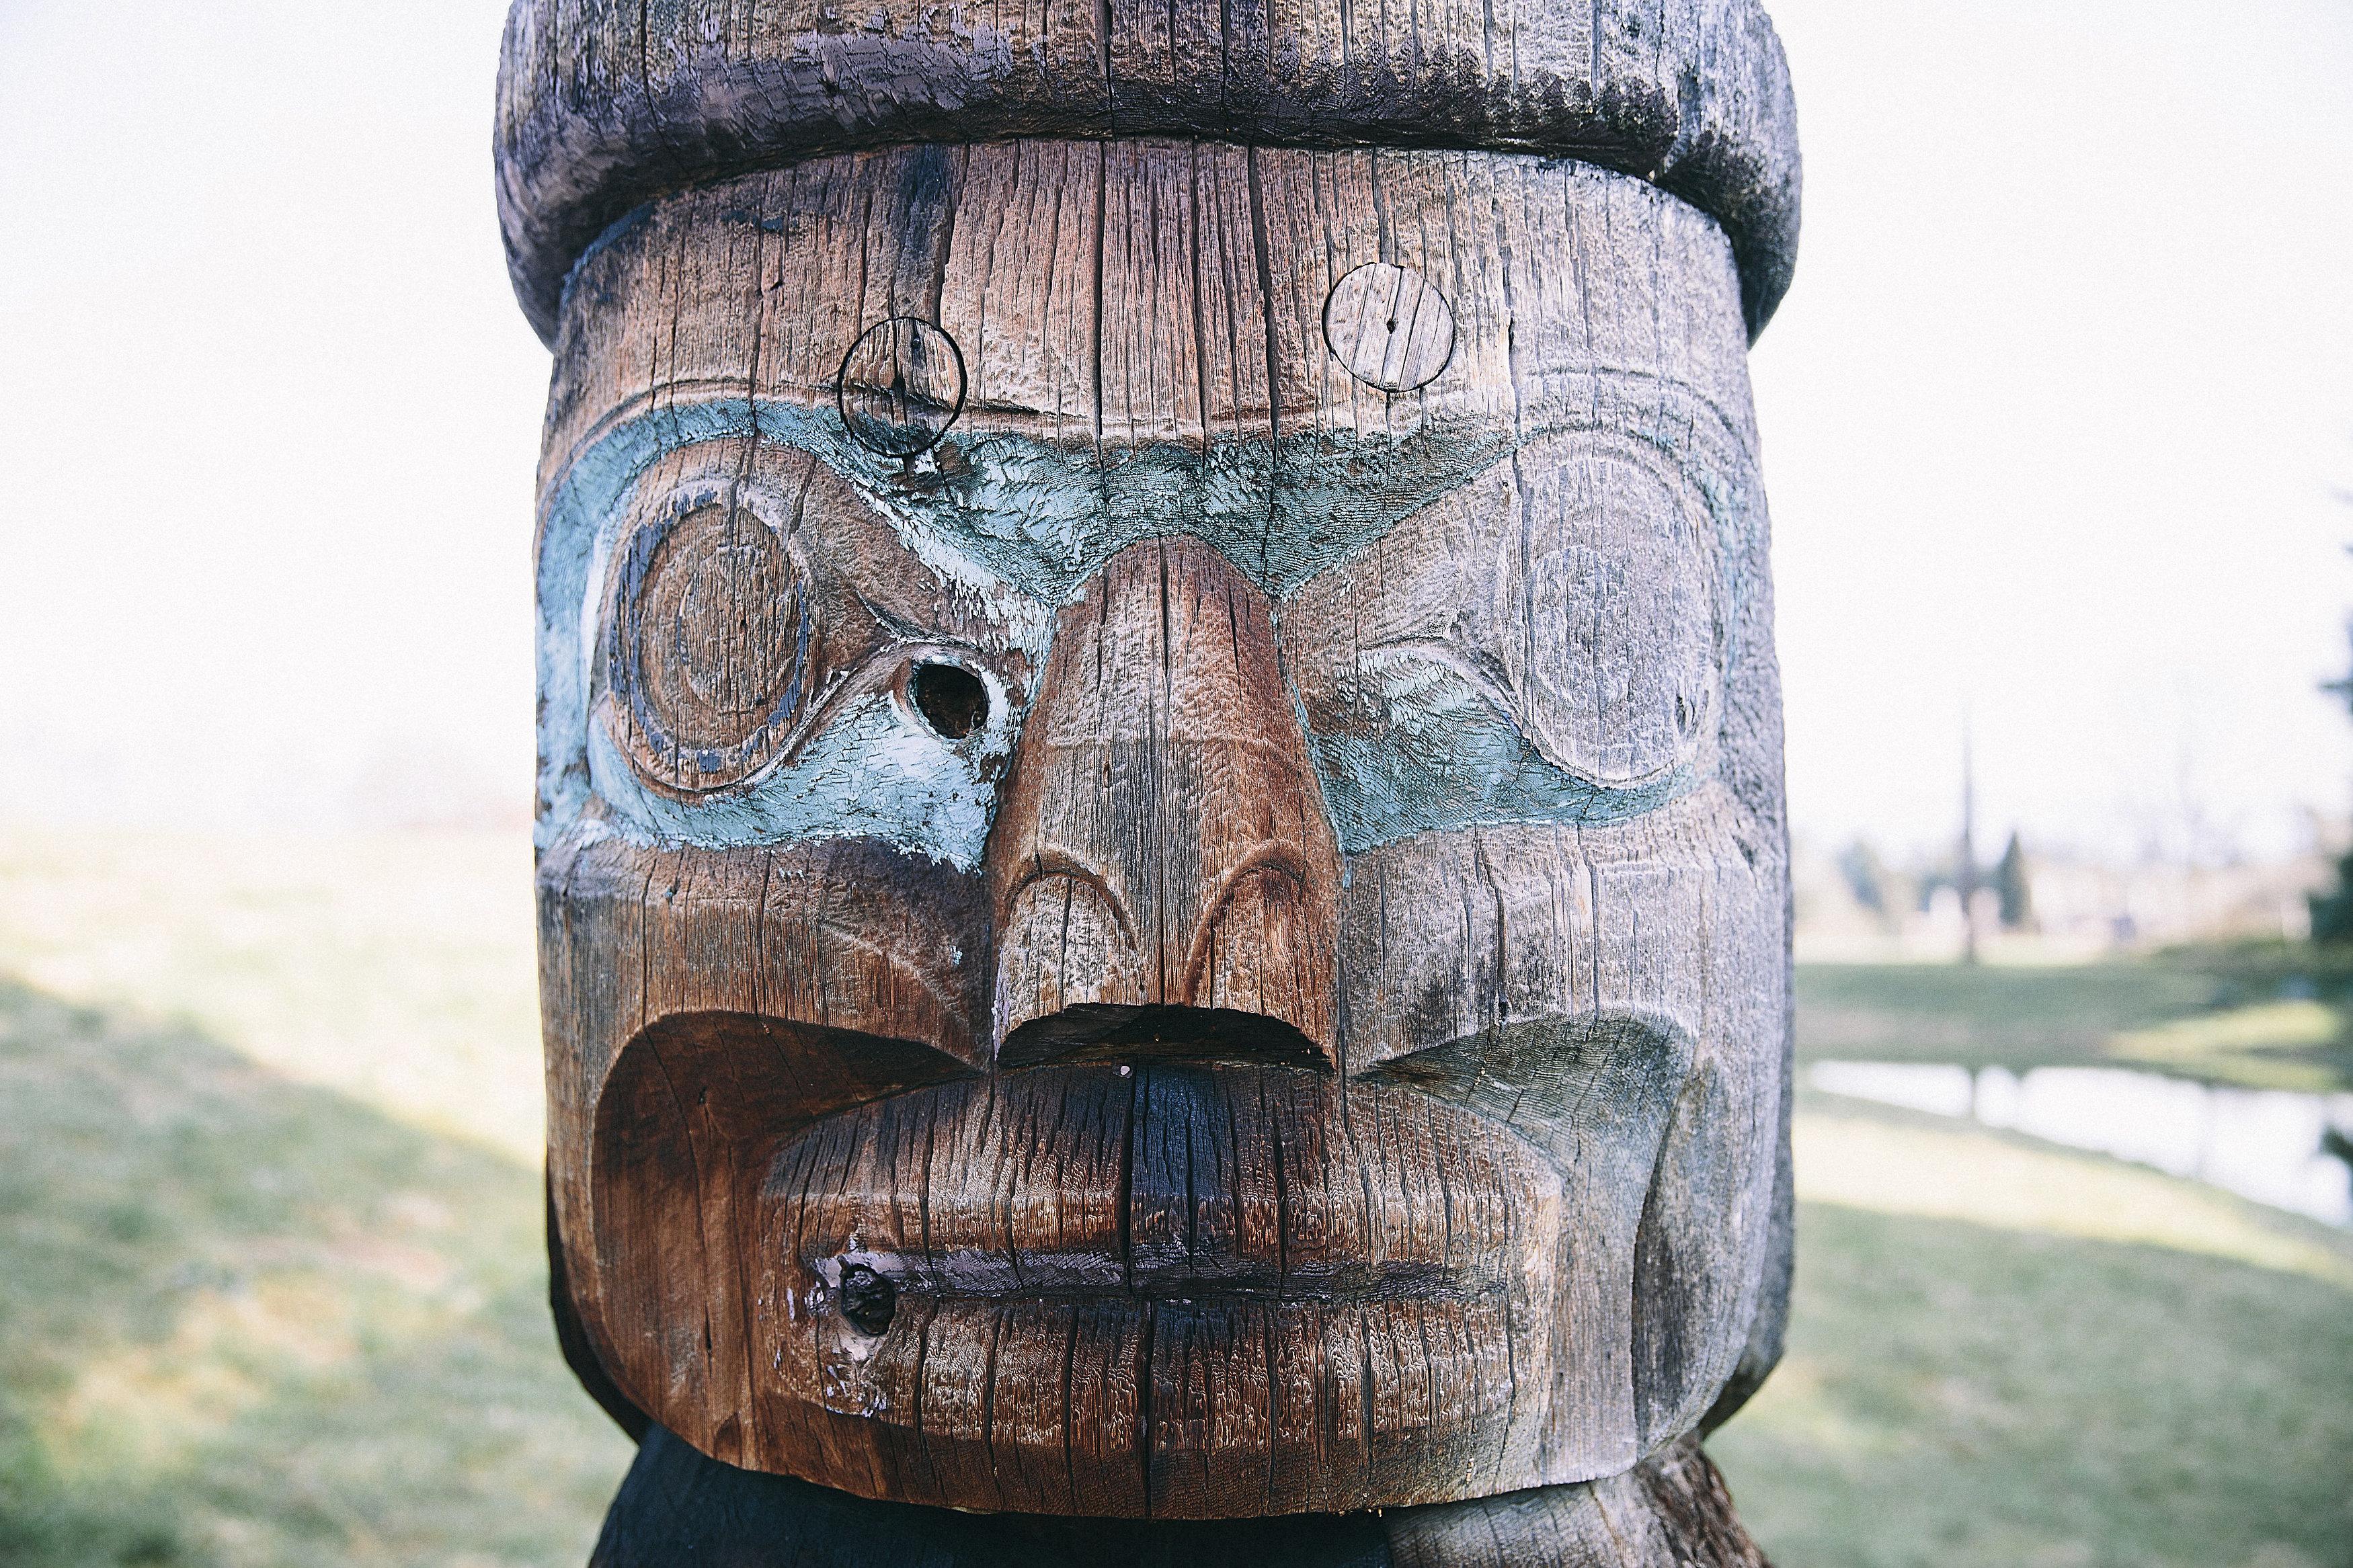 totem pole close-up